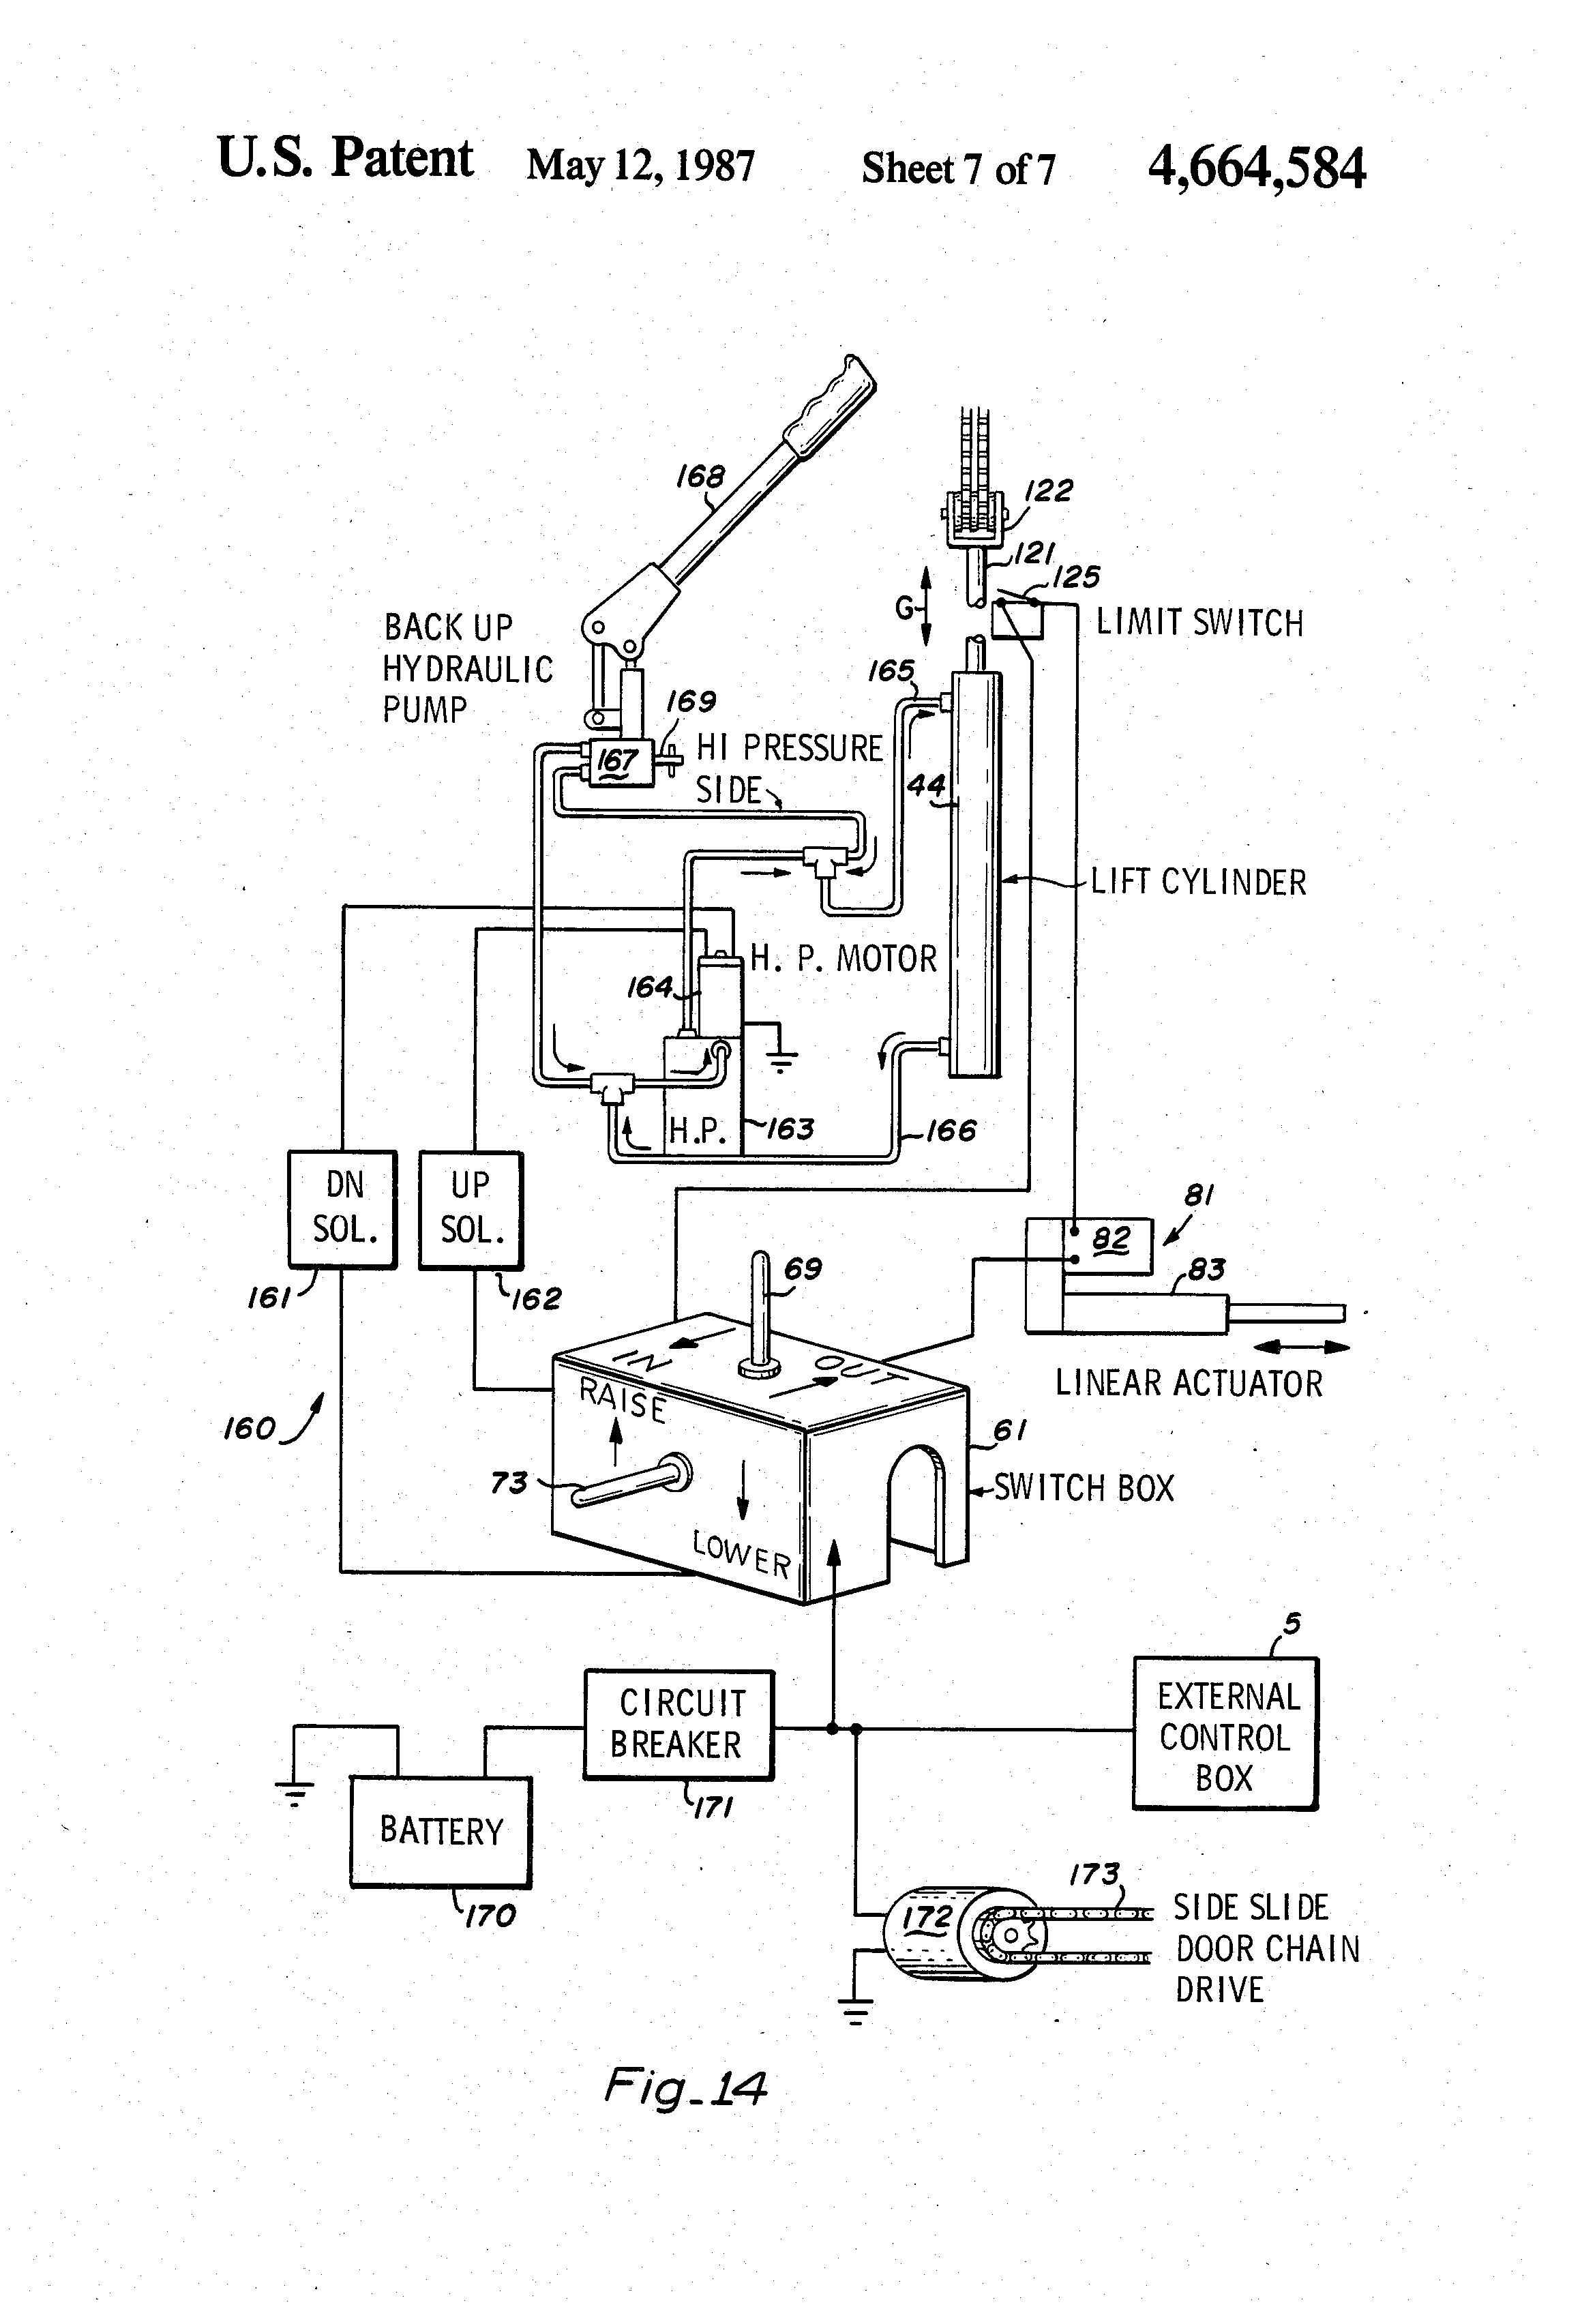 braun wheelchair lift wiring diagram Collection-Braun Lift Parts Diagram Elegant Automotive Lift Wiring Diagram Braun Wheelchair Lift Wiring Diagram Sample 7-b